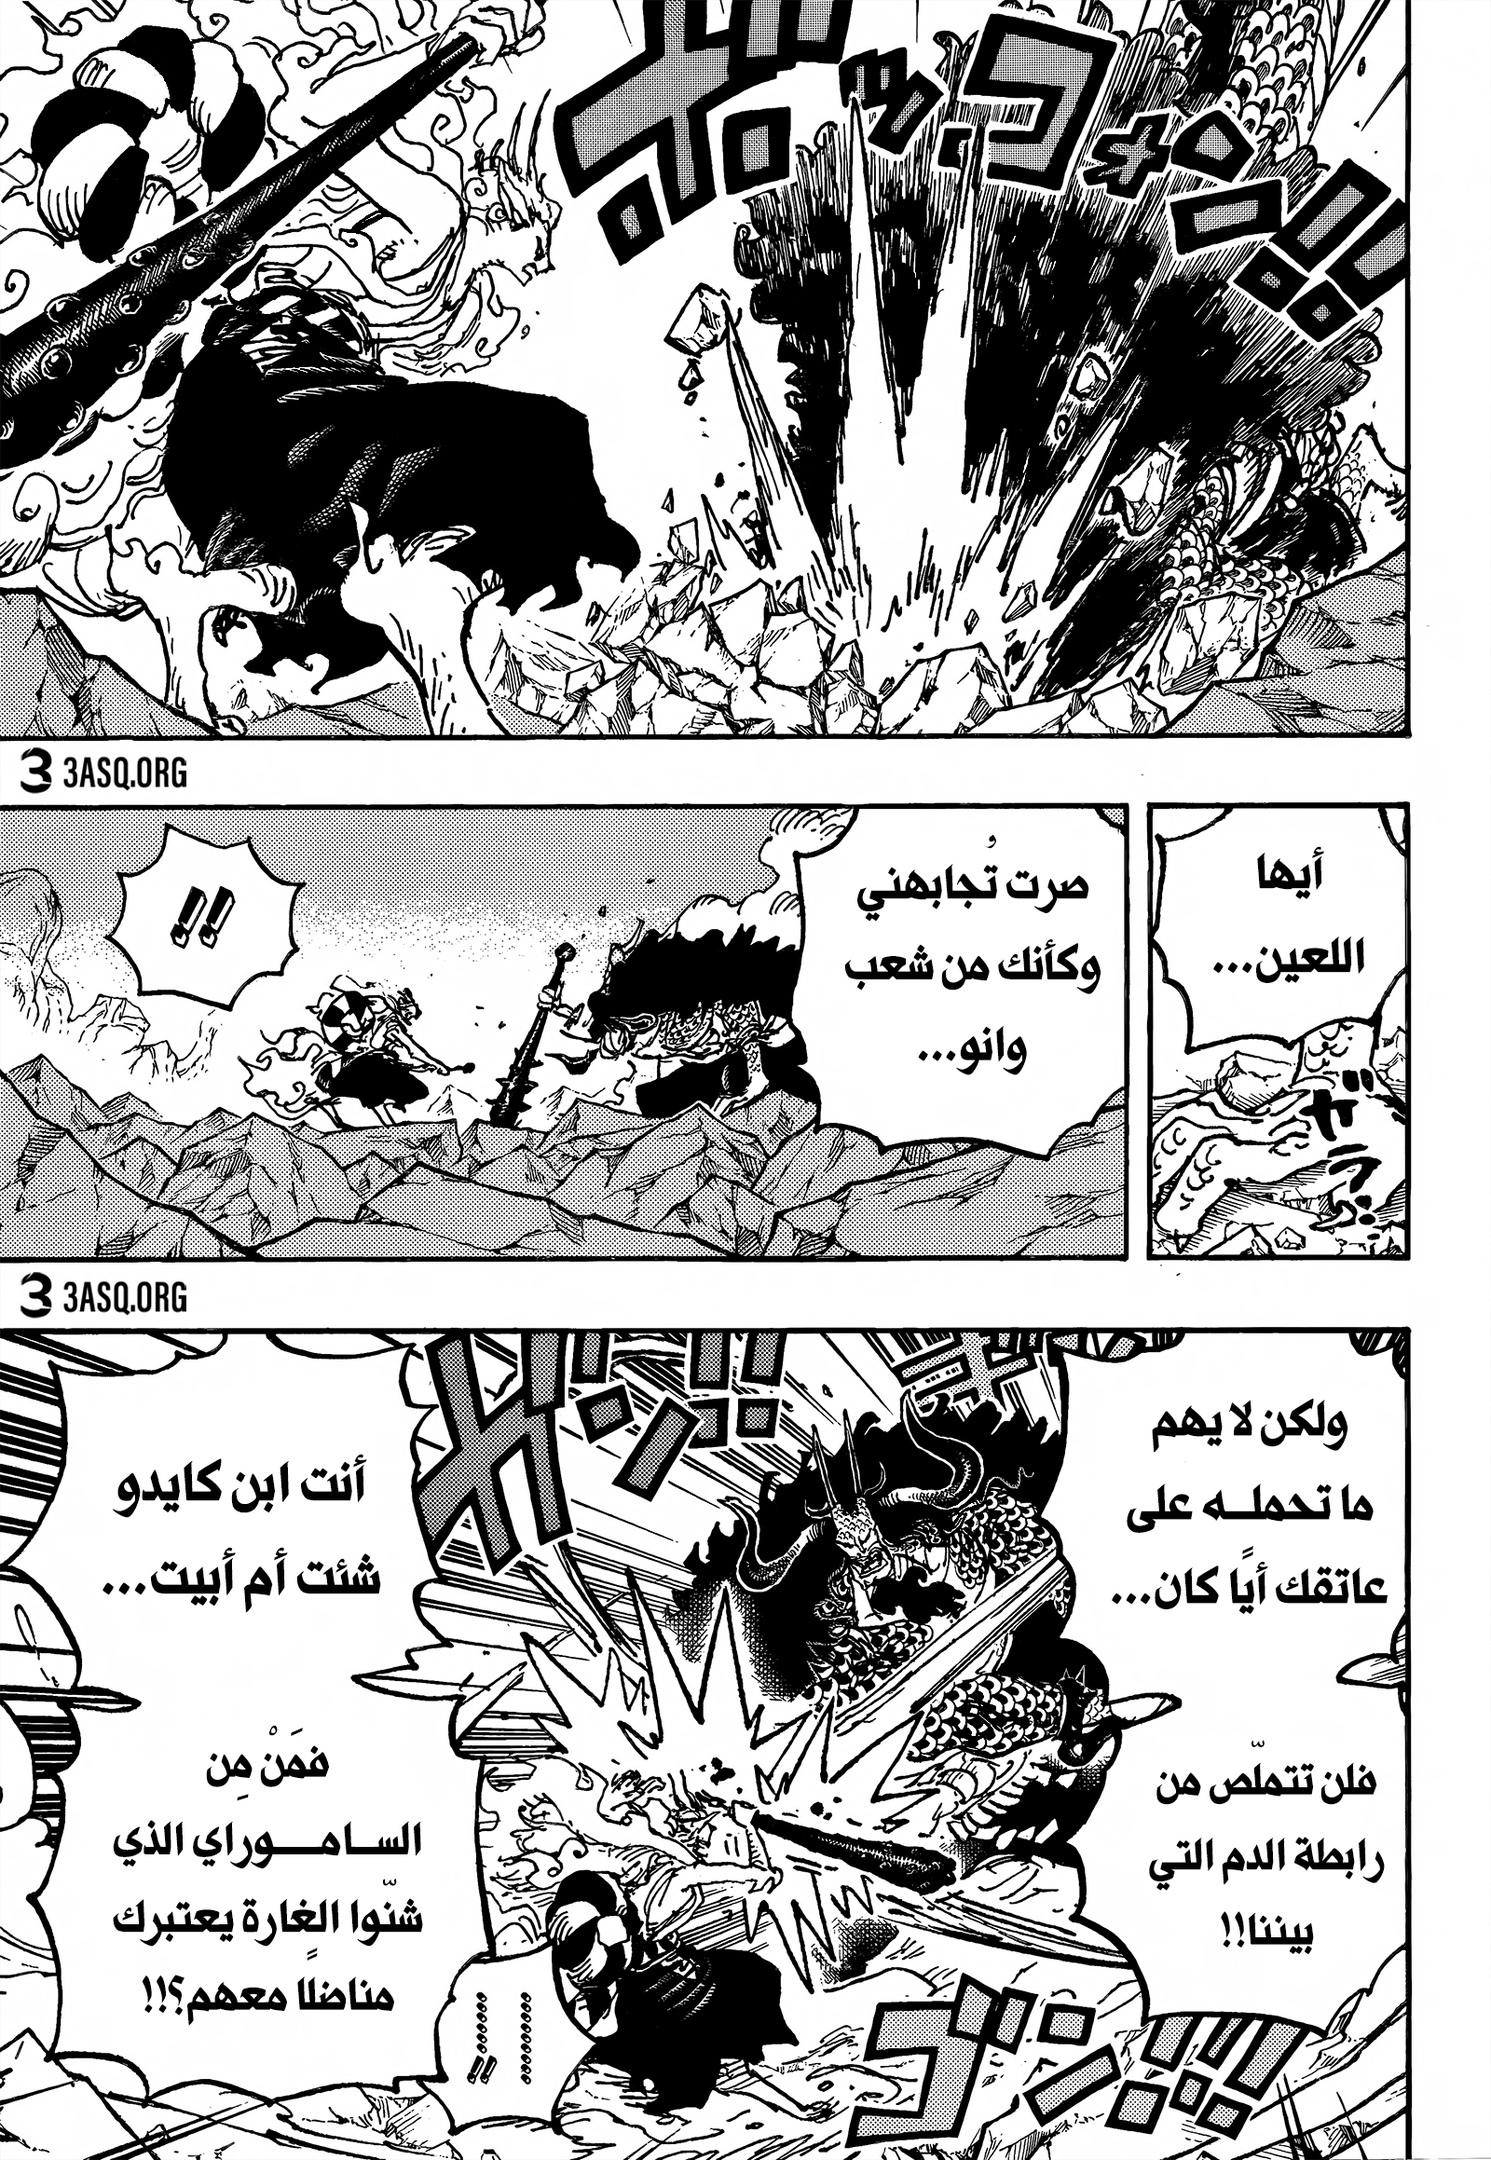 One Piece arab 1025, image №7